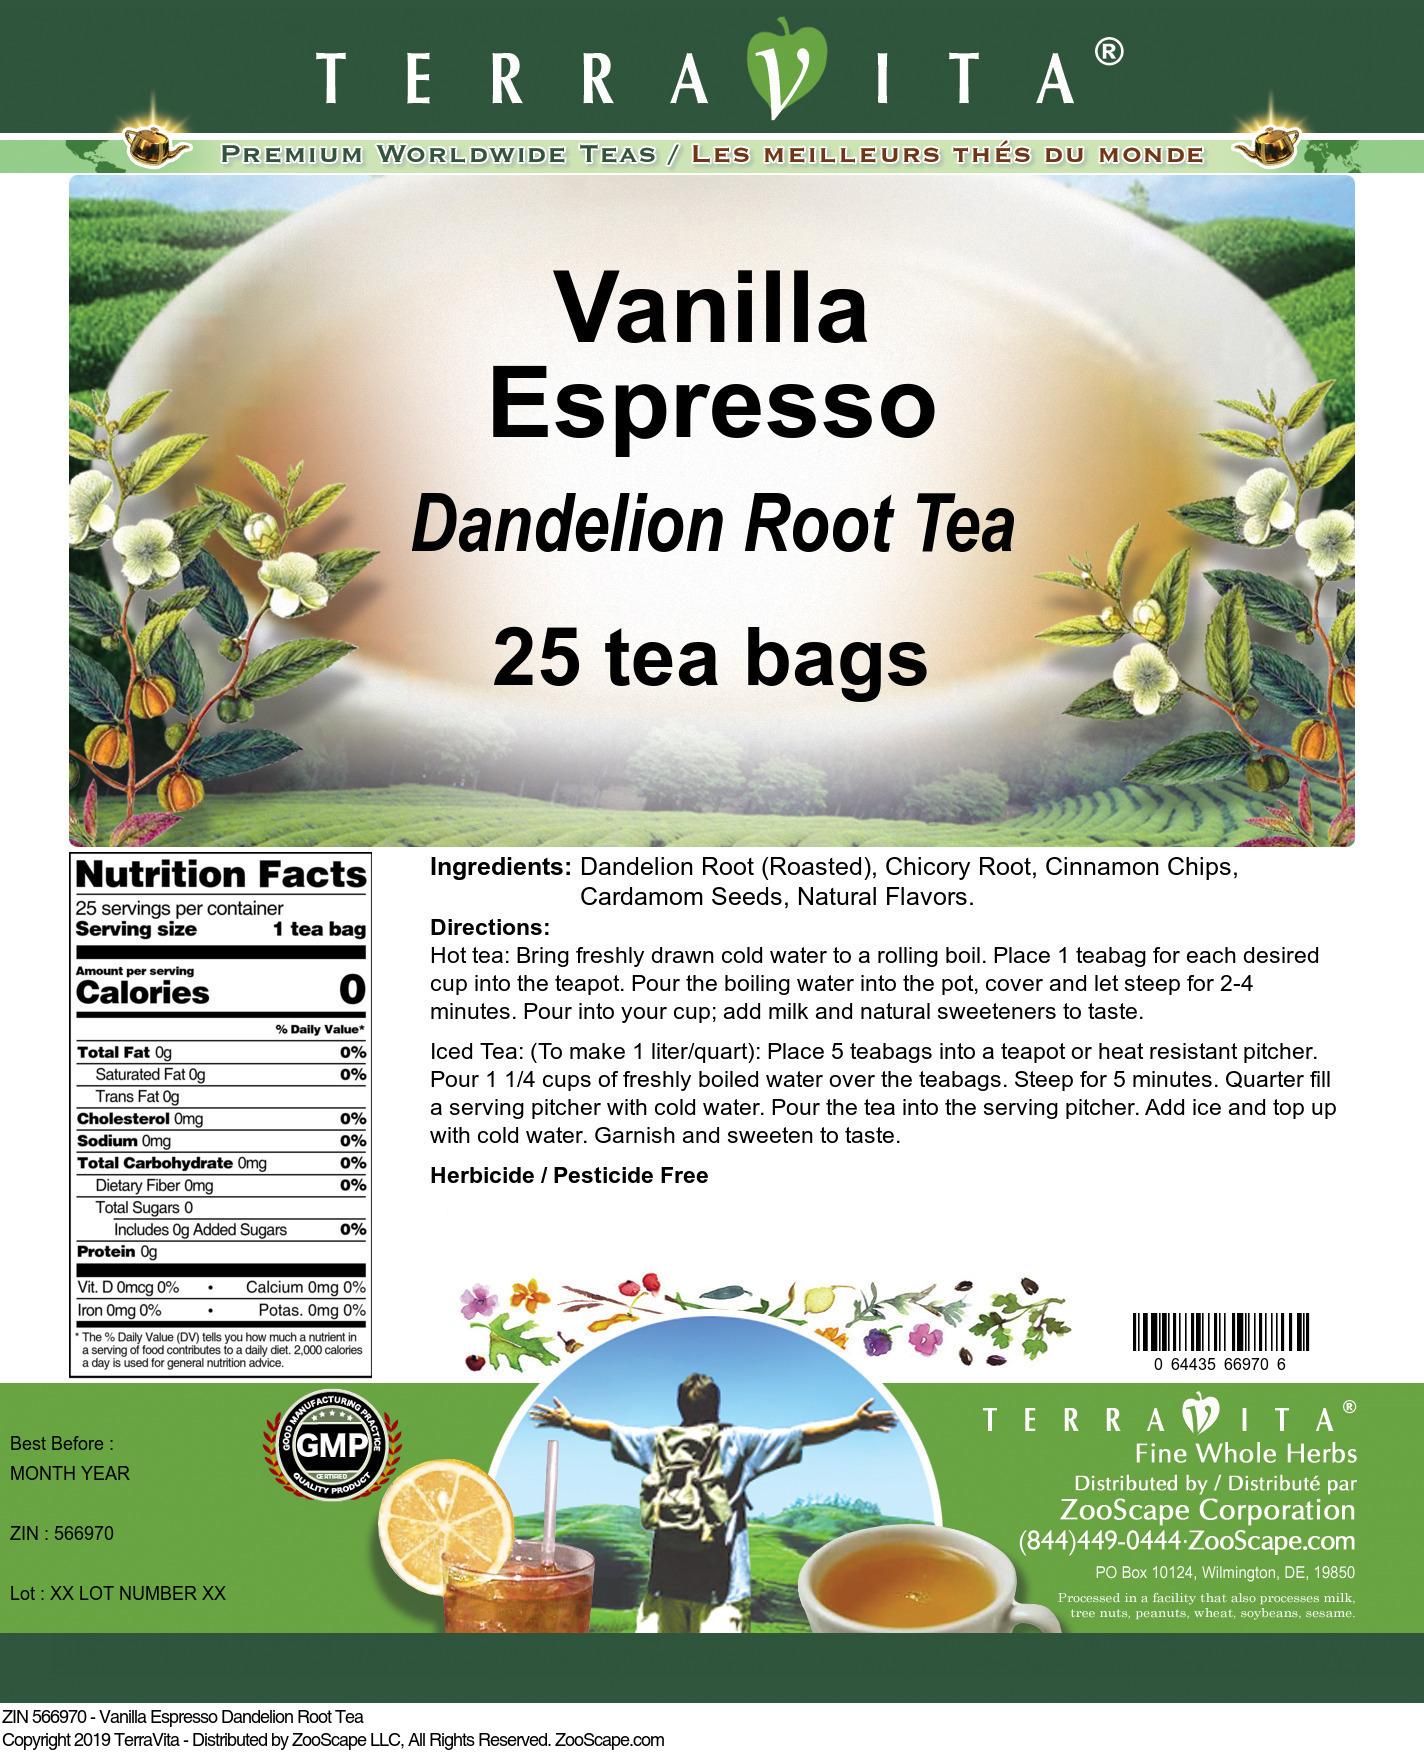 Vanilla Espresso Dandelion Root Tea